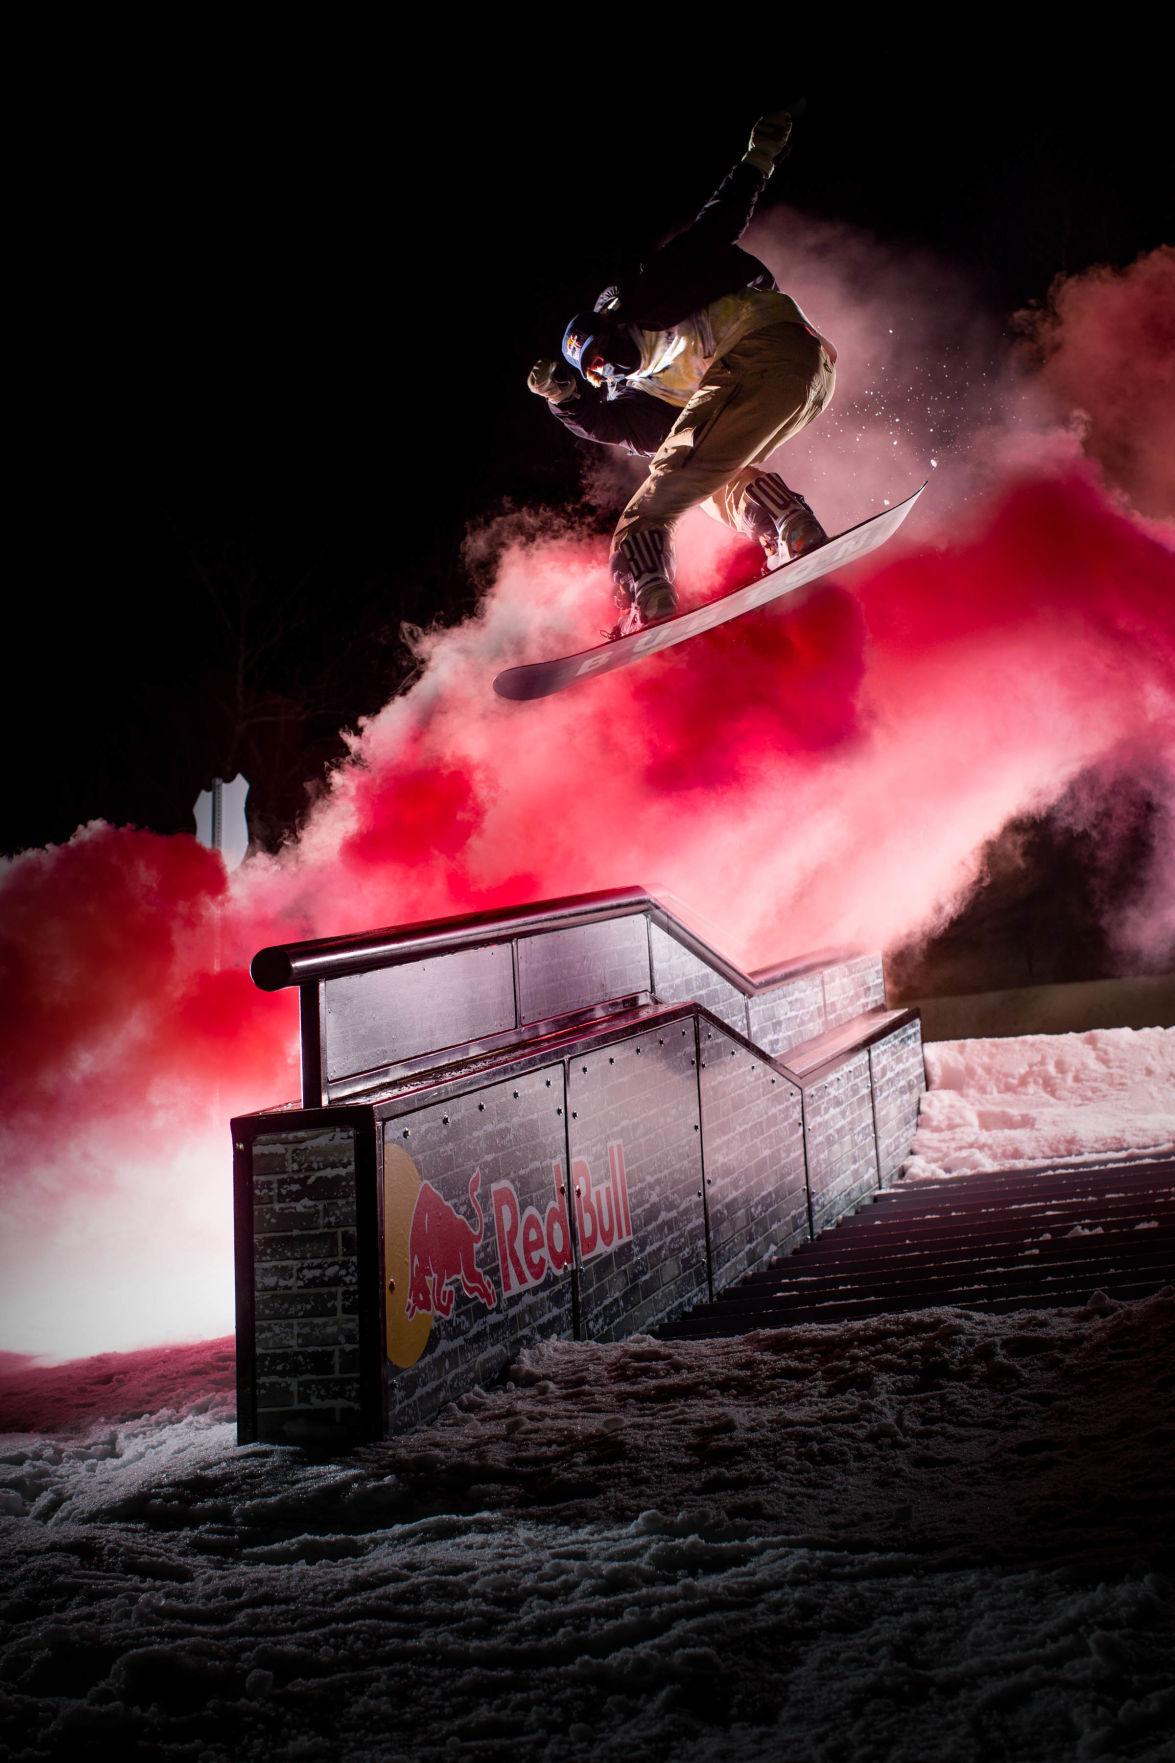 Luke Winkelmann in slopestyle